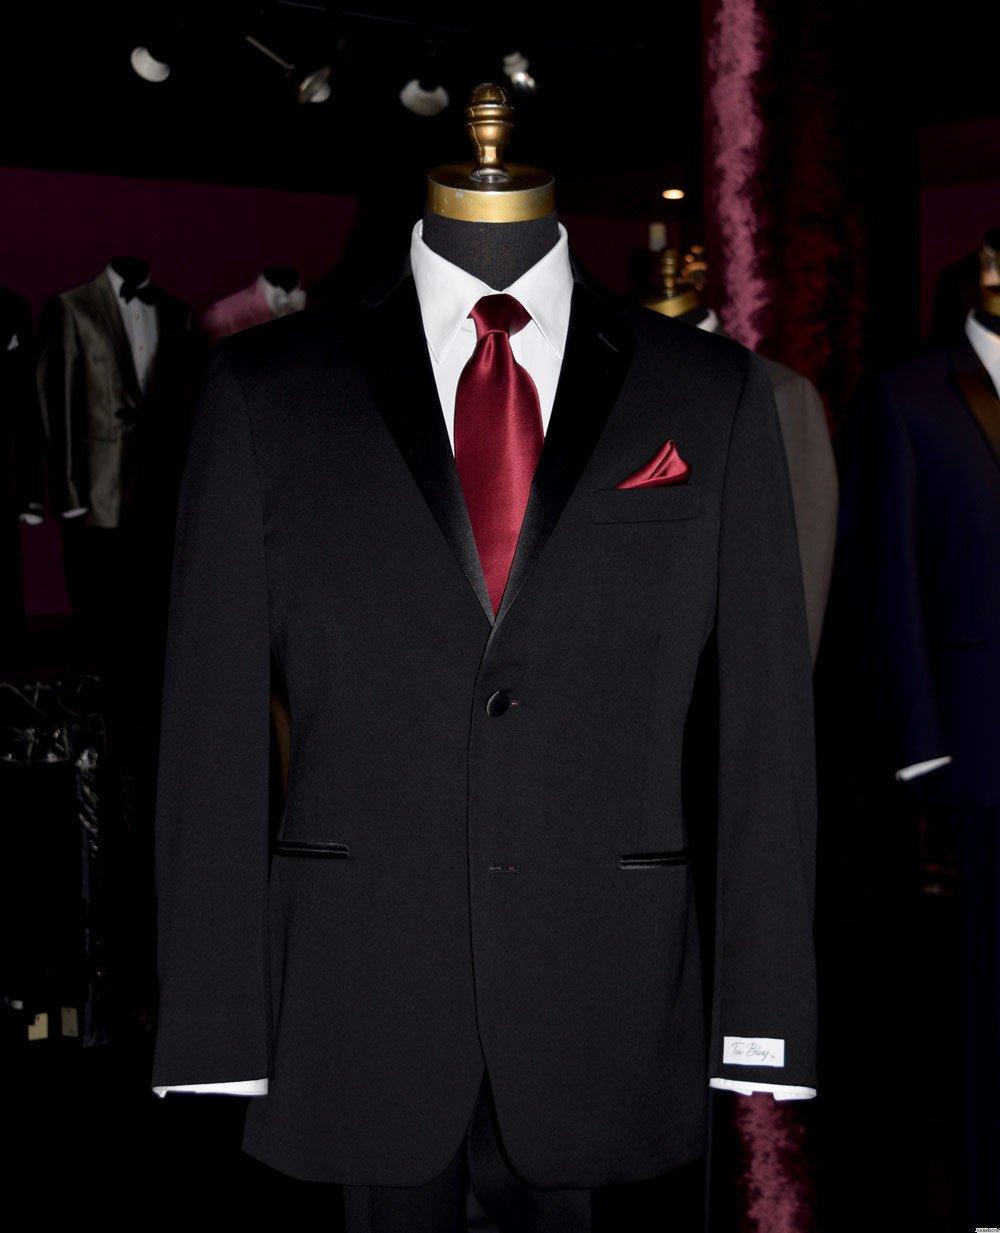 men's wine long silk dress tie and matching pocket hanky from tuxbling.com